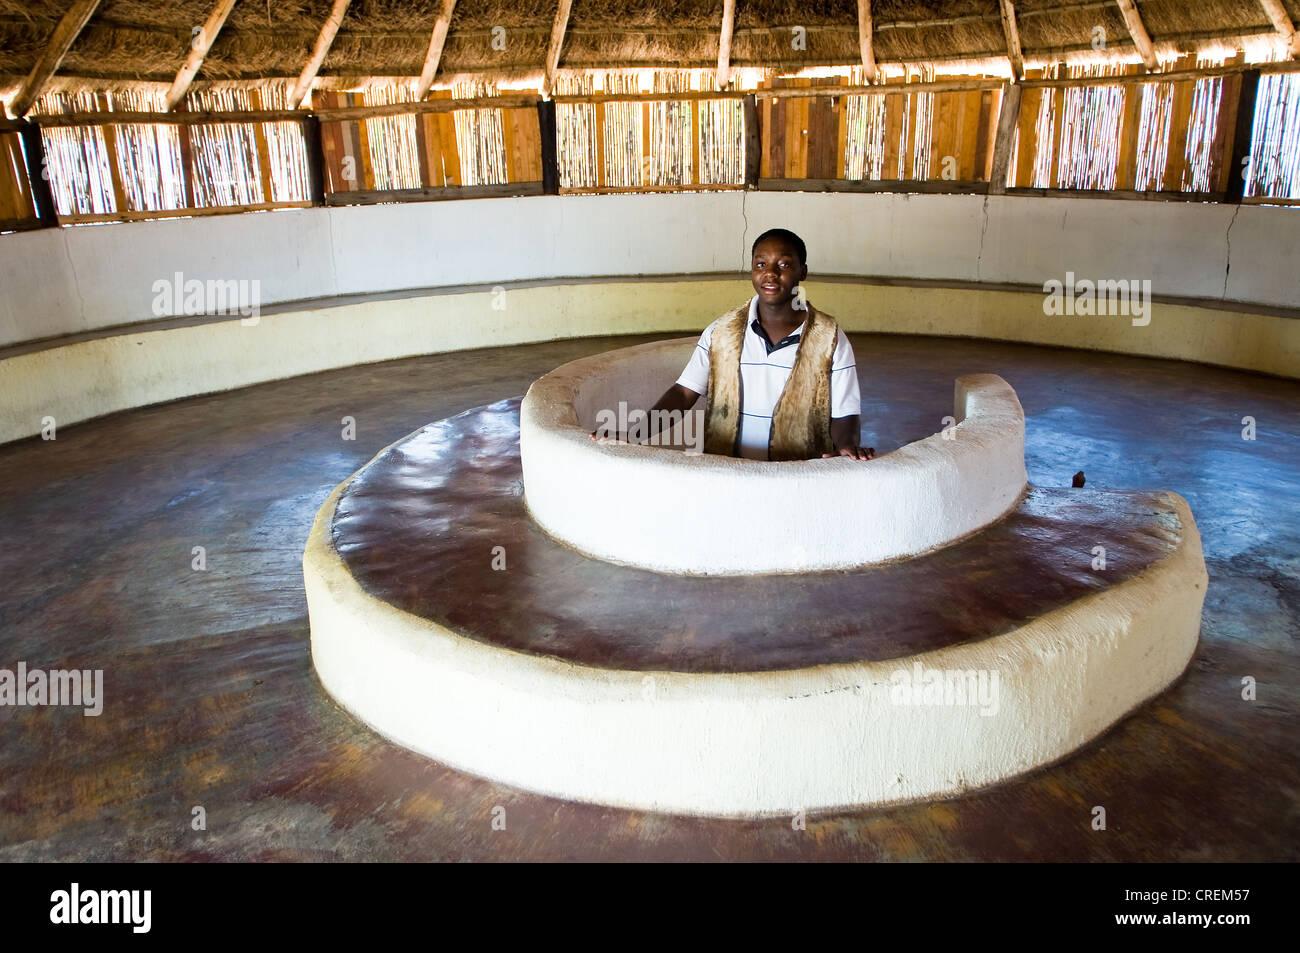 shangaan tribal culture Mafuyane Cultural Village Hoedspruit south africa - Stock Image